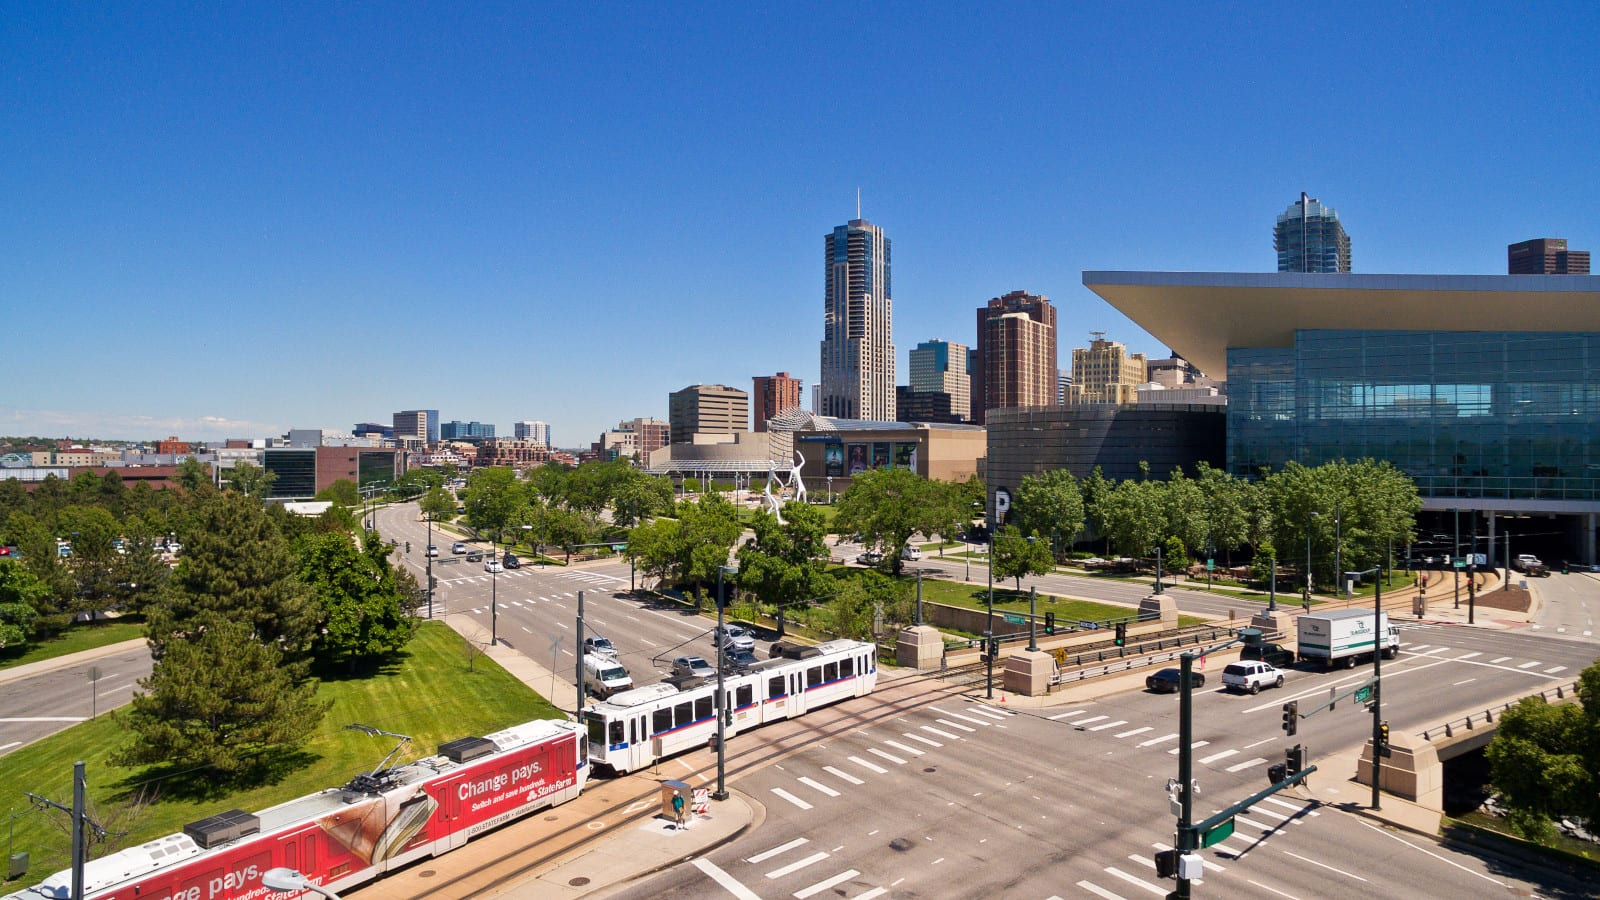 RTD Train Downtown Denver Colorado Aerial View